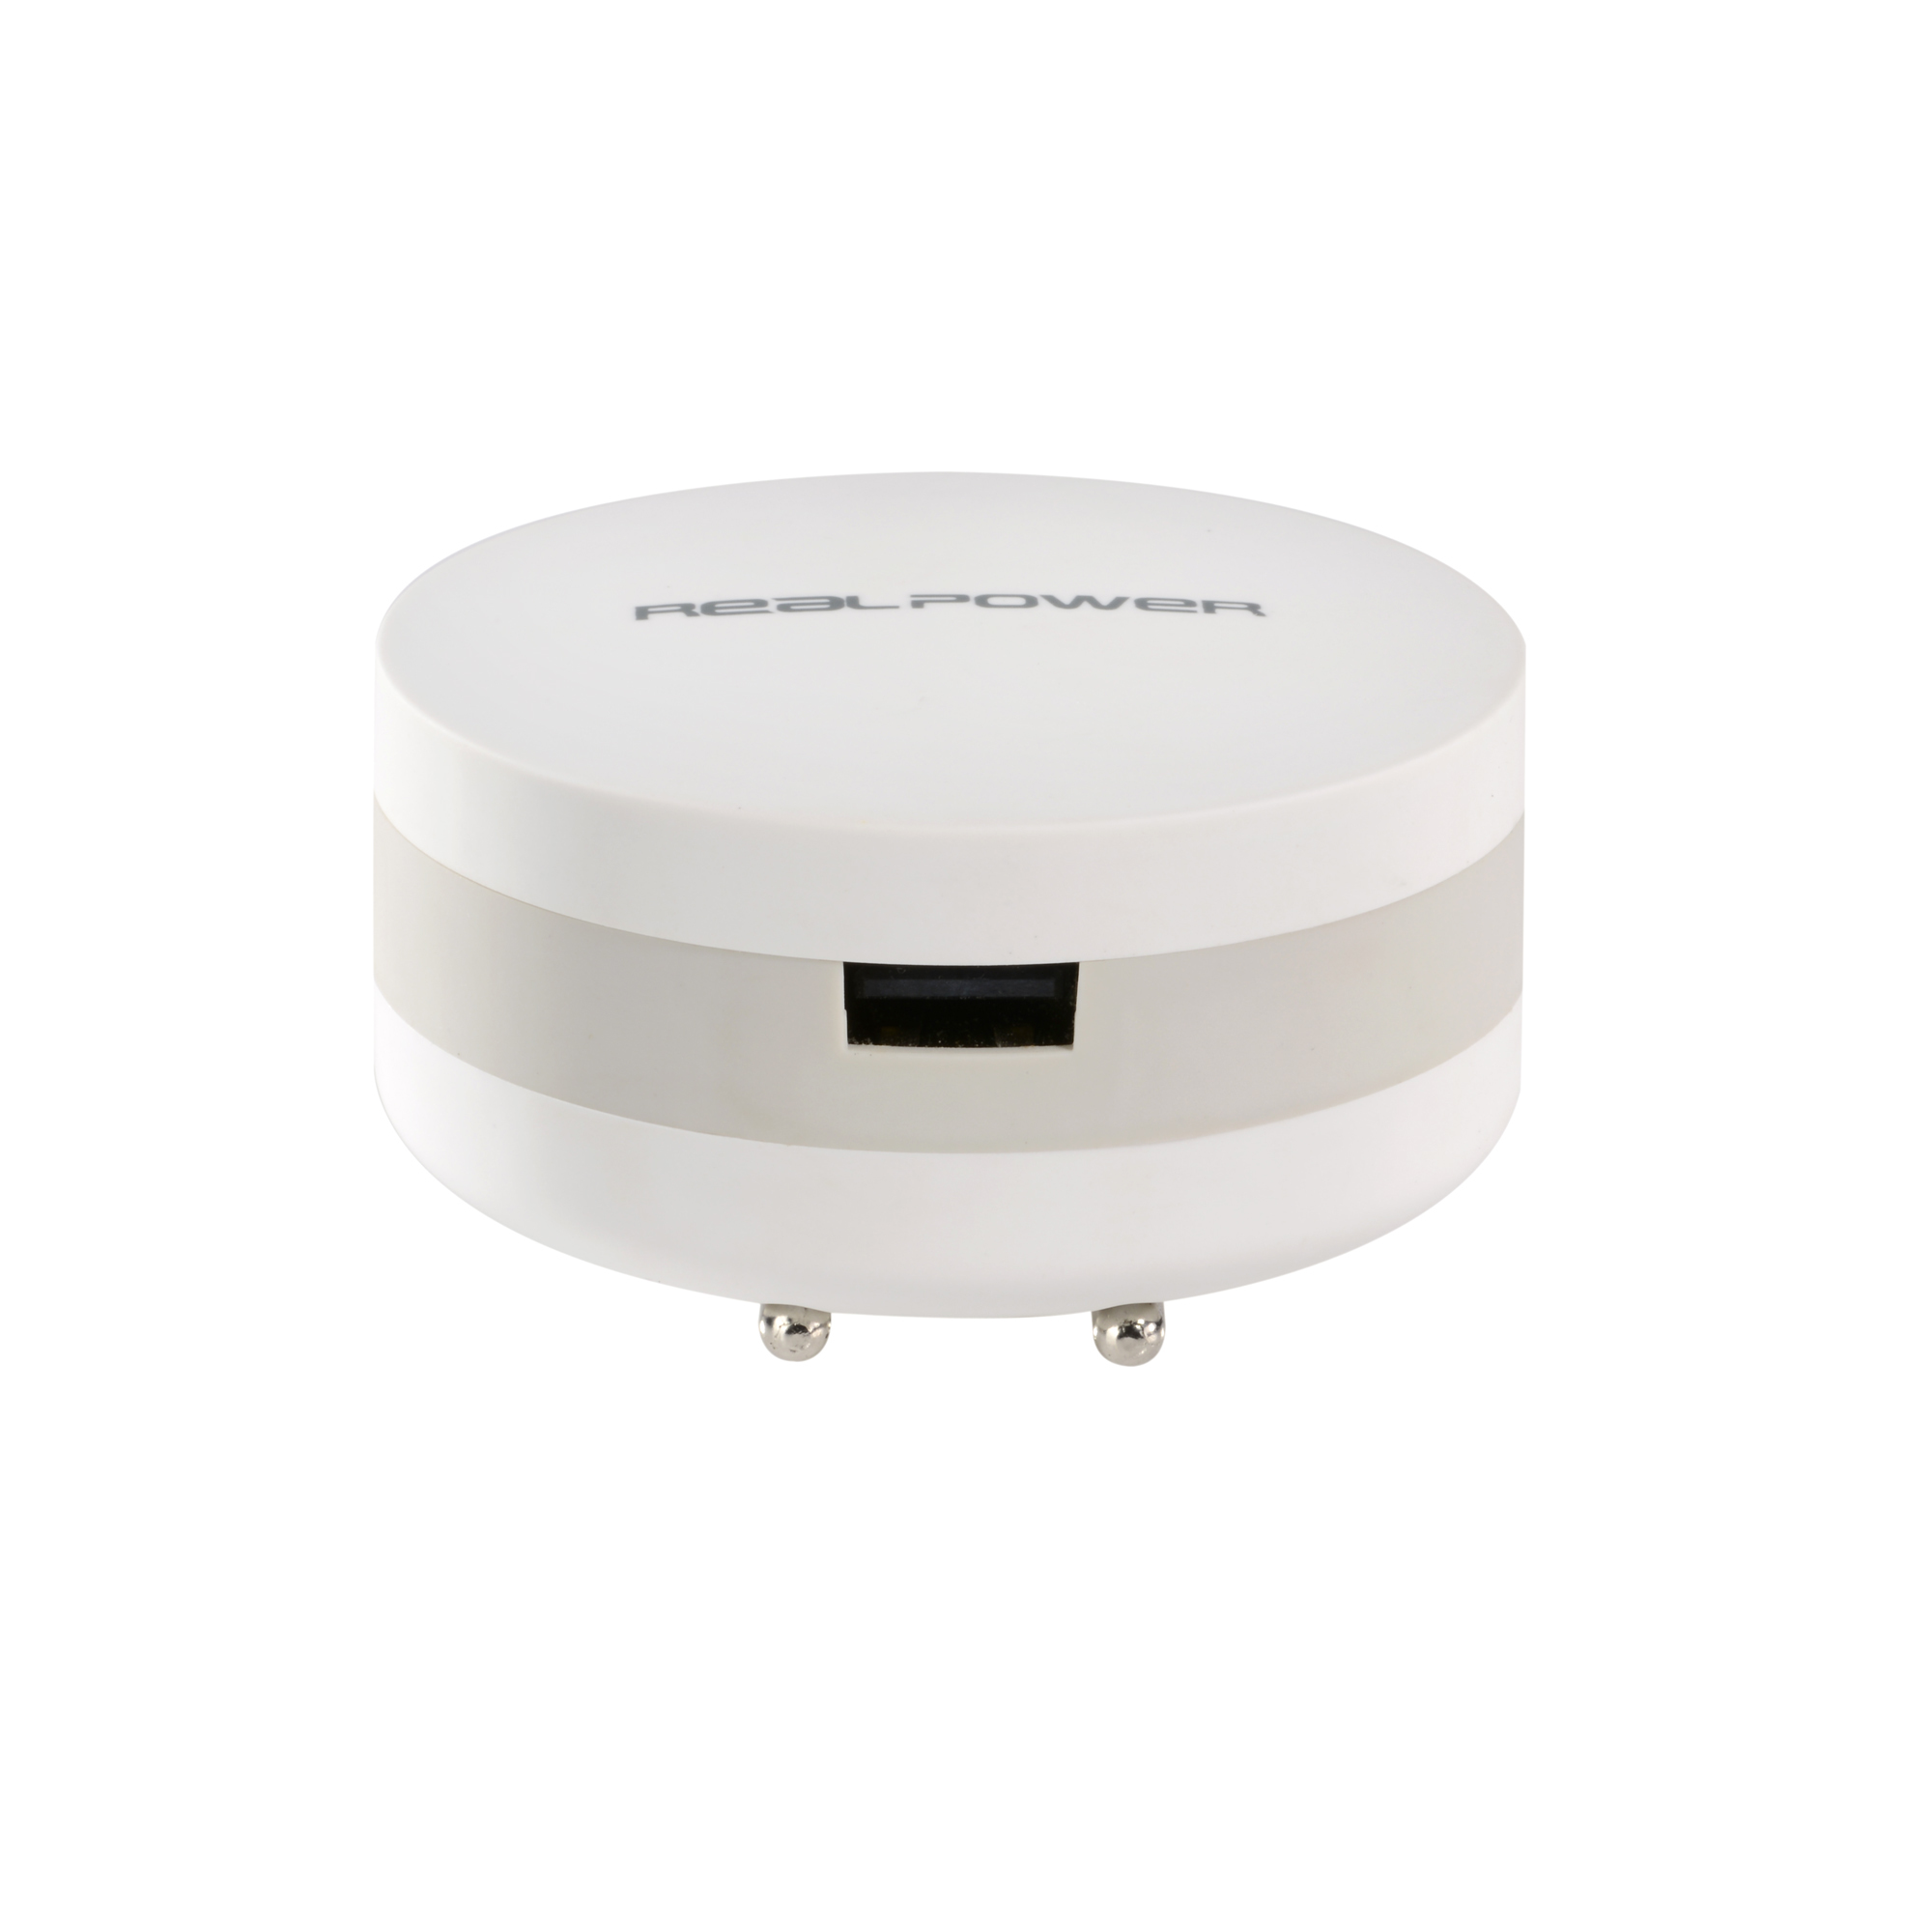 RealPower PBC-1800 - Weiß - Universal - 1800 mAh - AC - 1,8 A - 1 Stück(e)